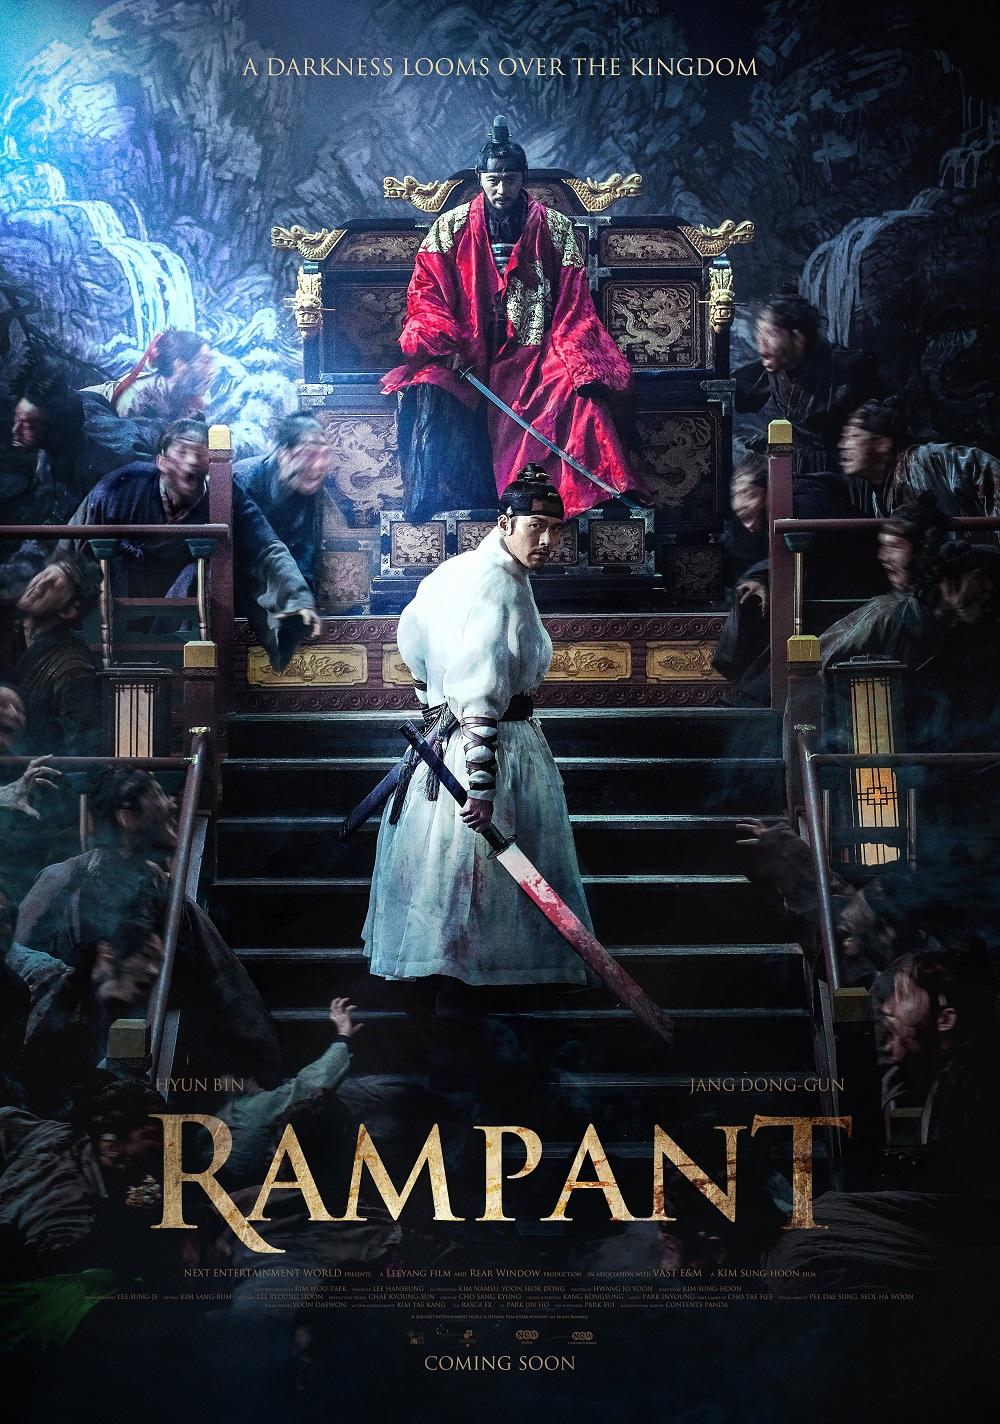 RAMPANT_INT'L MAIN POSTER_jpg.jpg